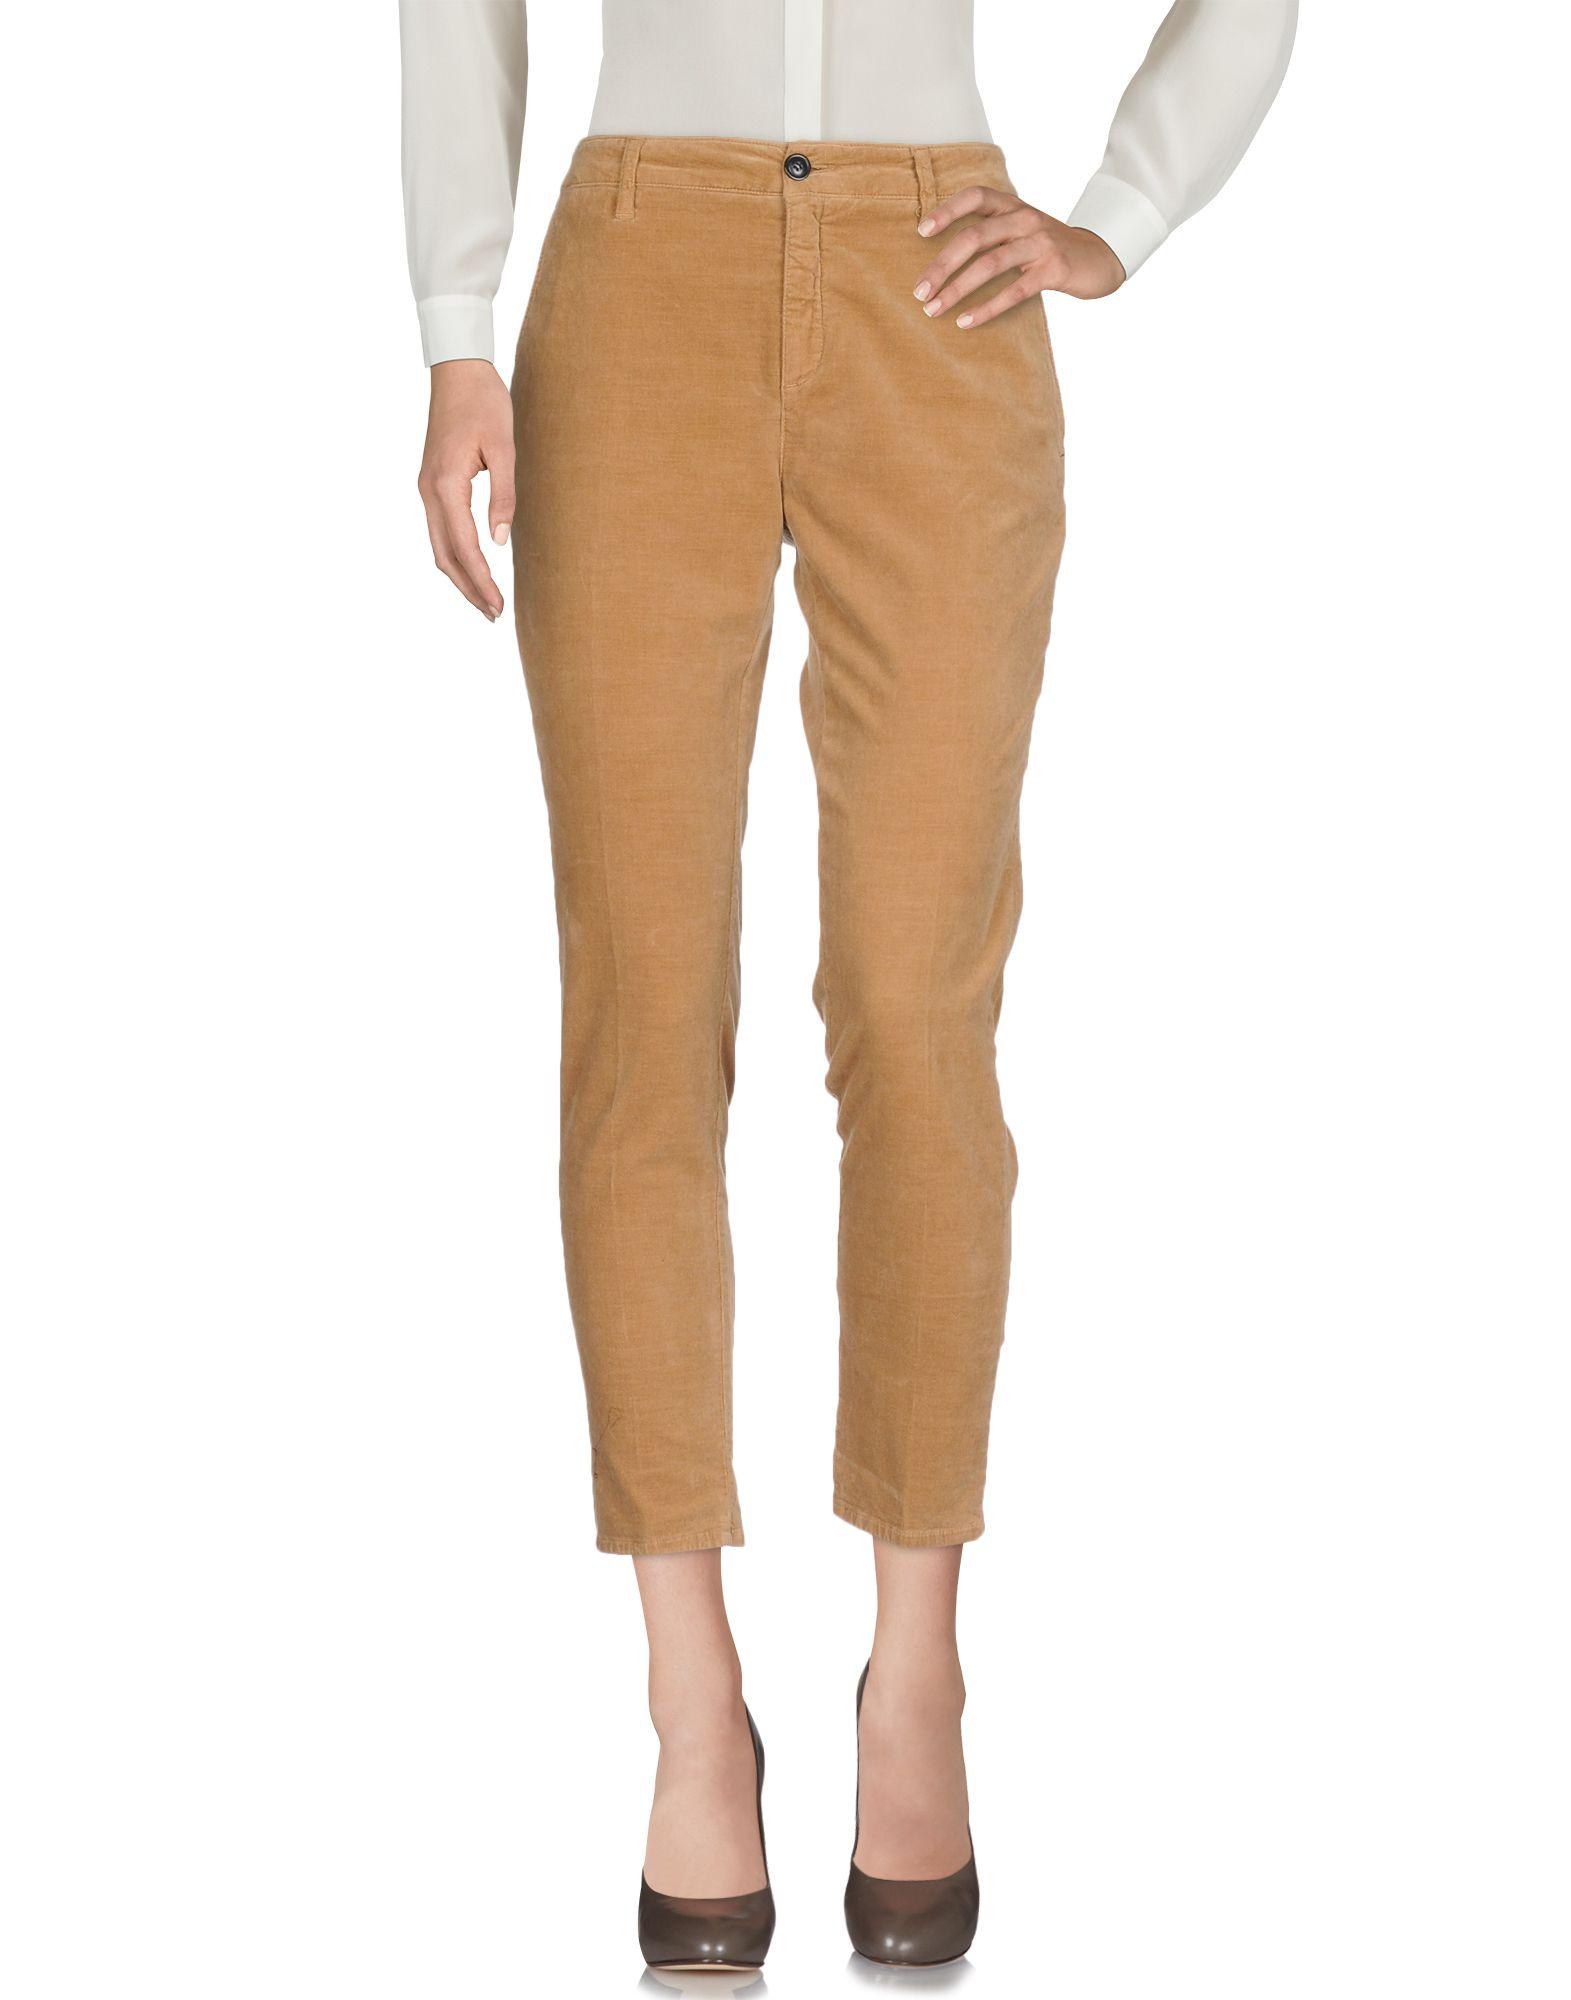 Pantalone Department 5 Donna - Acquista online su KcOJhA